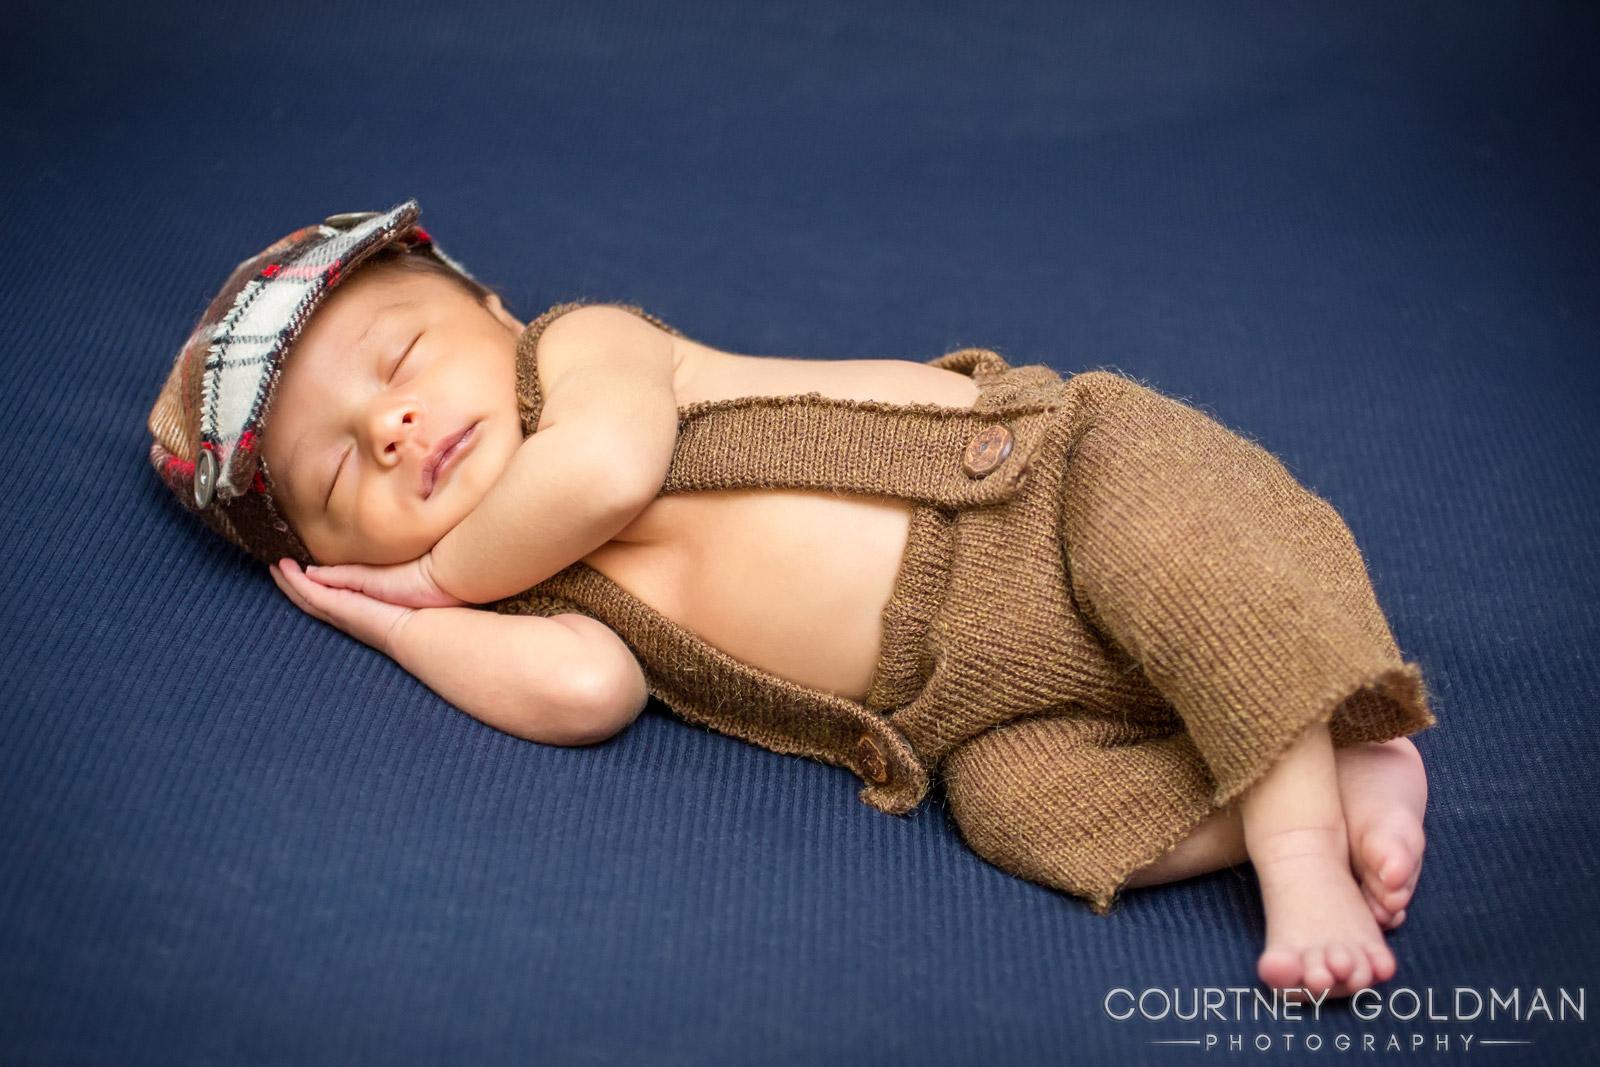 Atlanta Maternity and Newborn Photography by Courtney Goldman 16.jpg